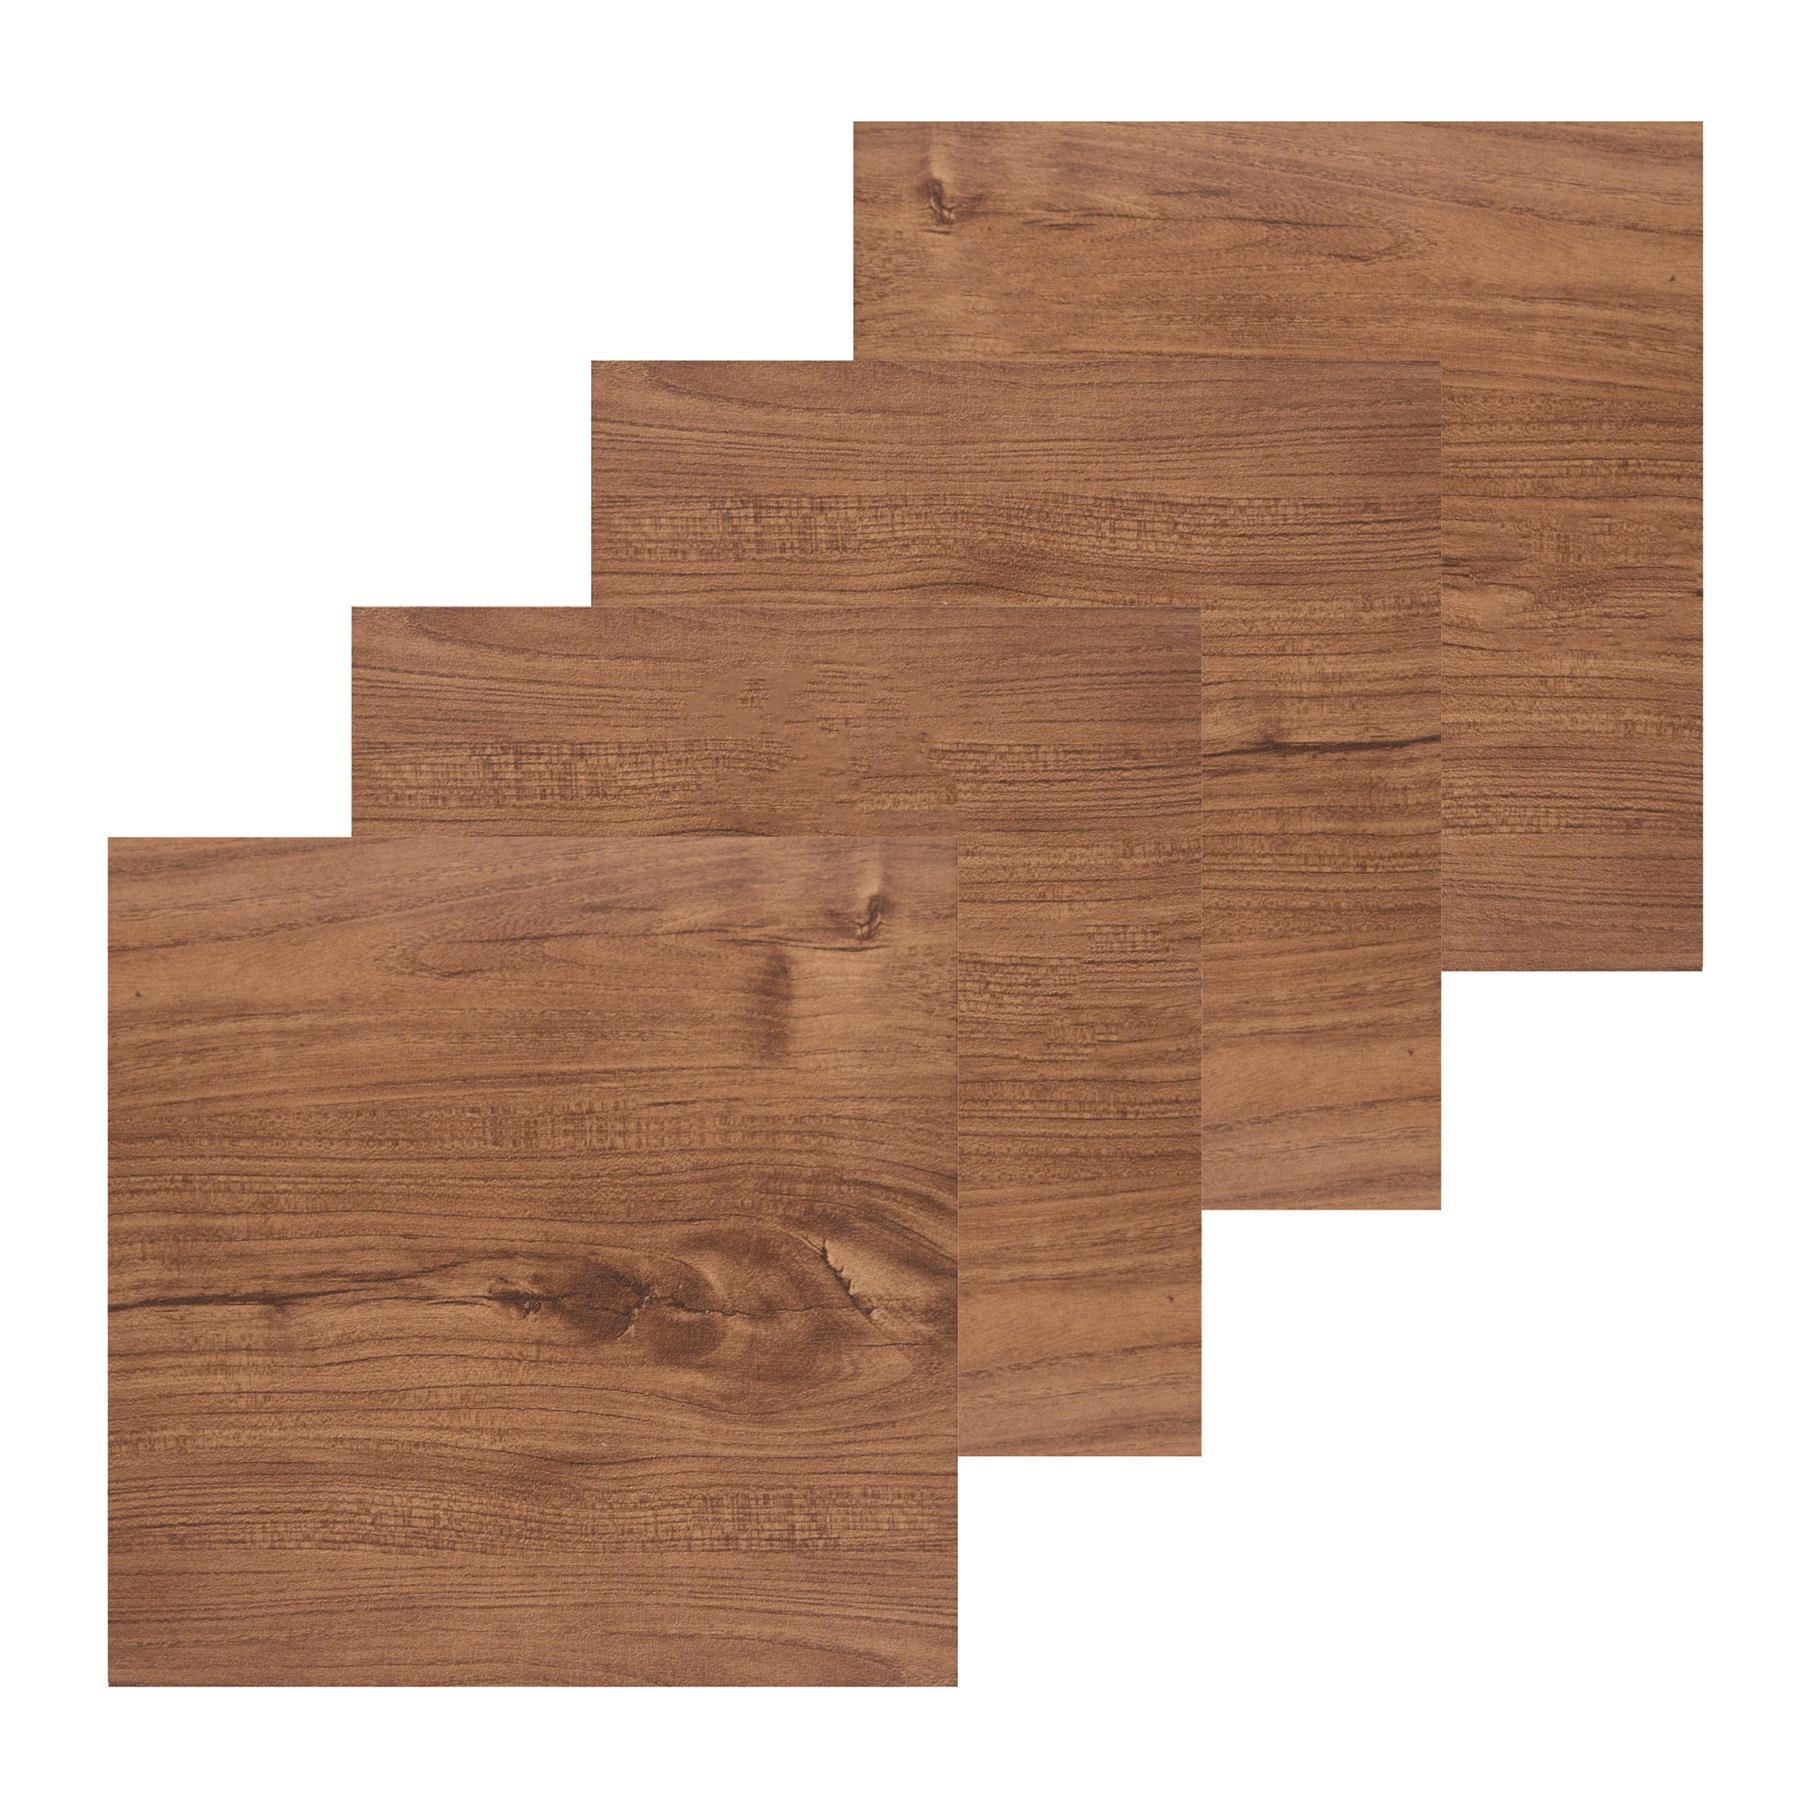 Floor-Tiles-Self-Adhesive-Vinyl-Flooring-Kitchen-Bathroom-Brown-Wood-Grain thumbnail 22